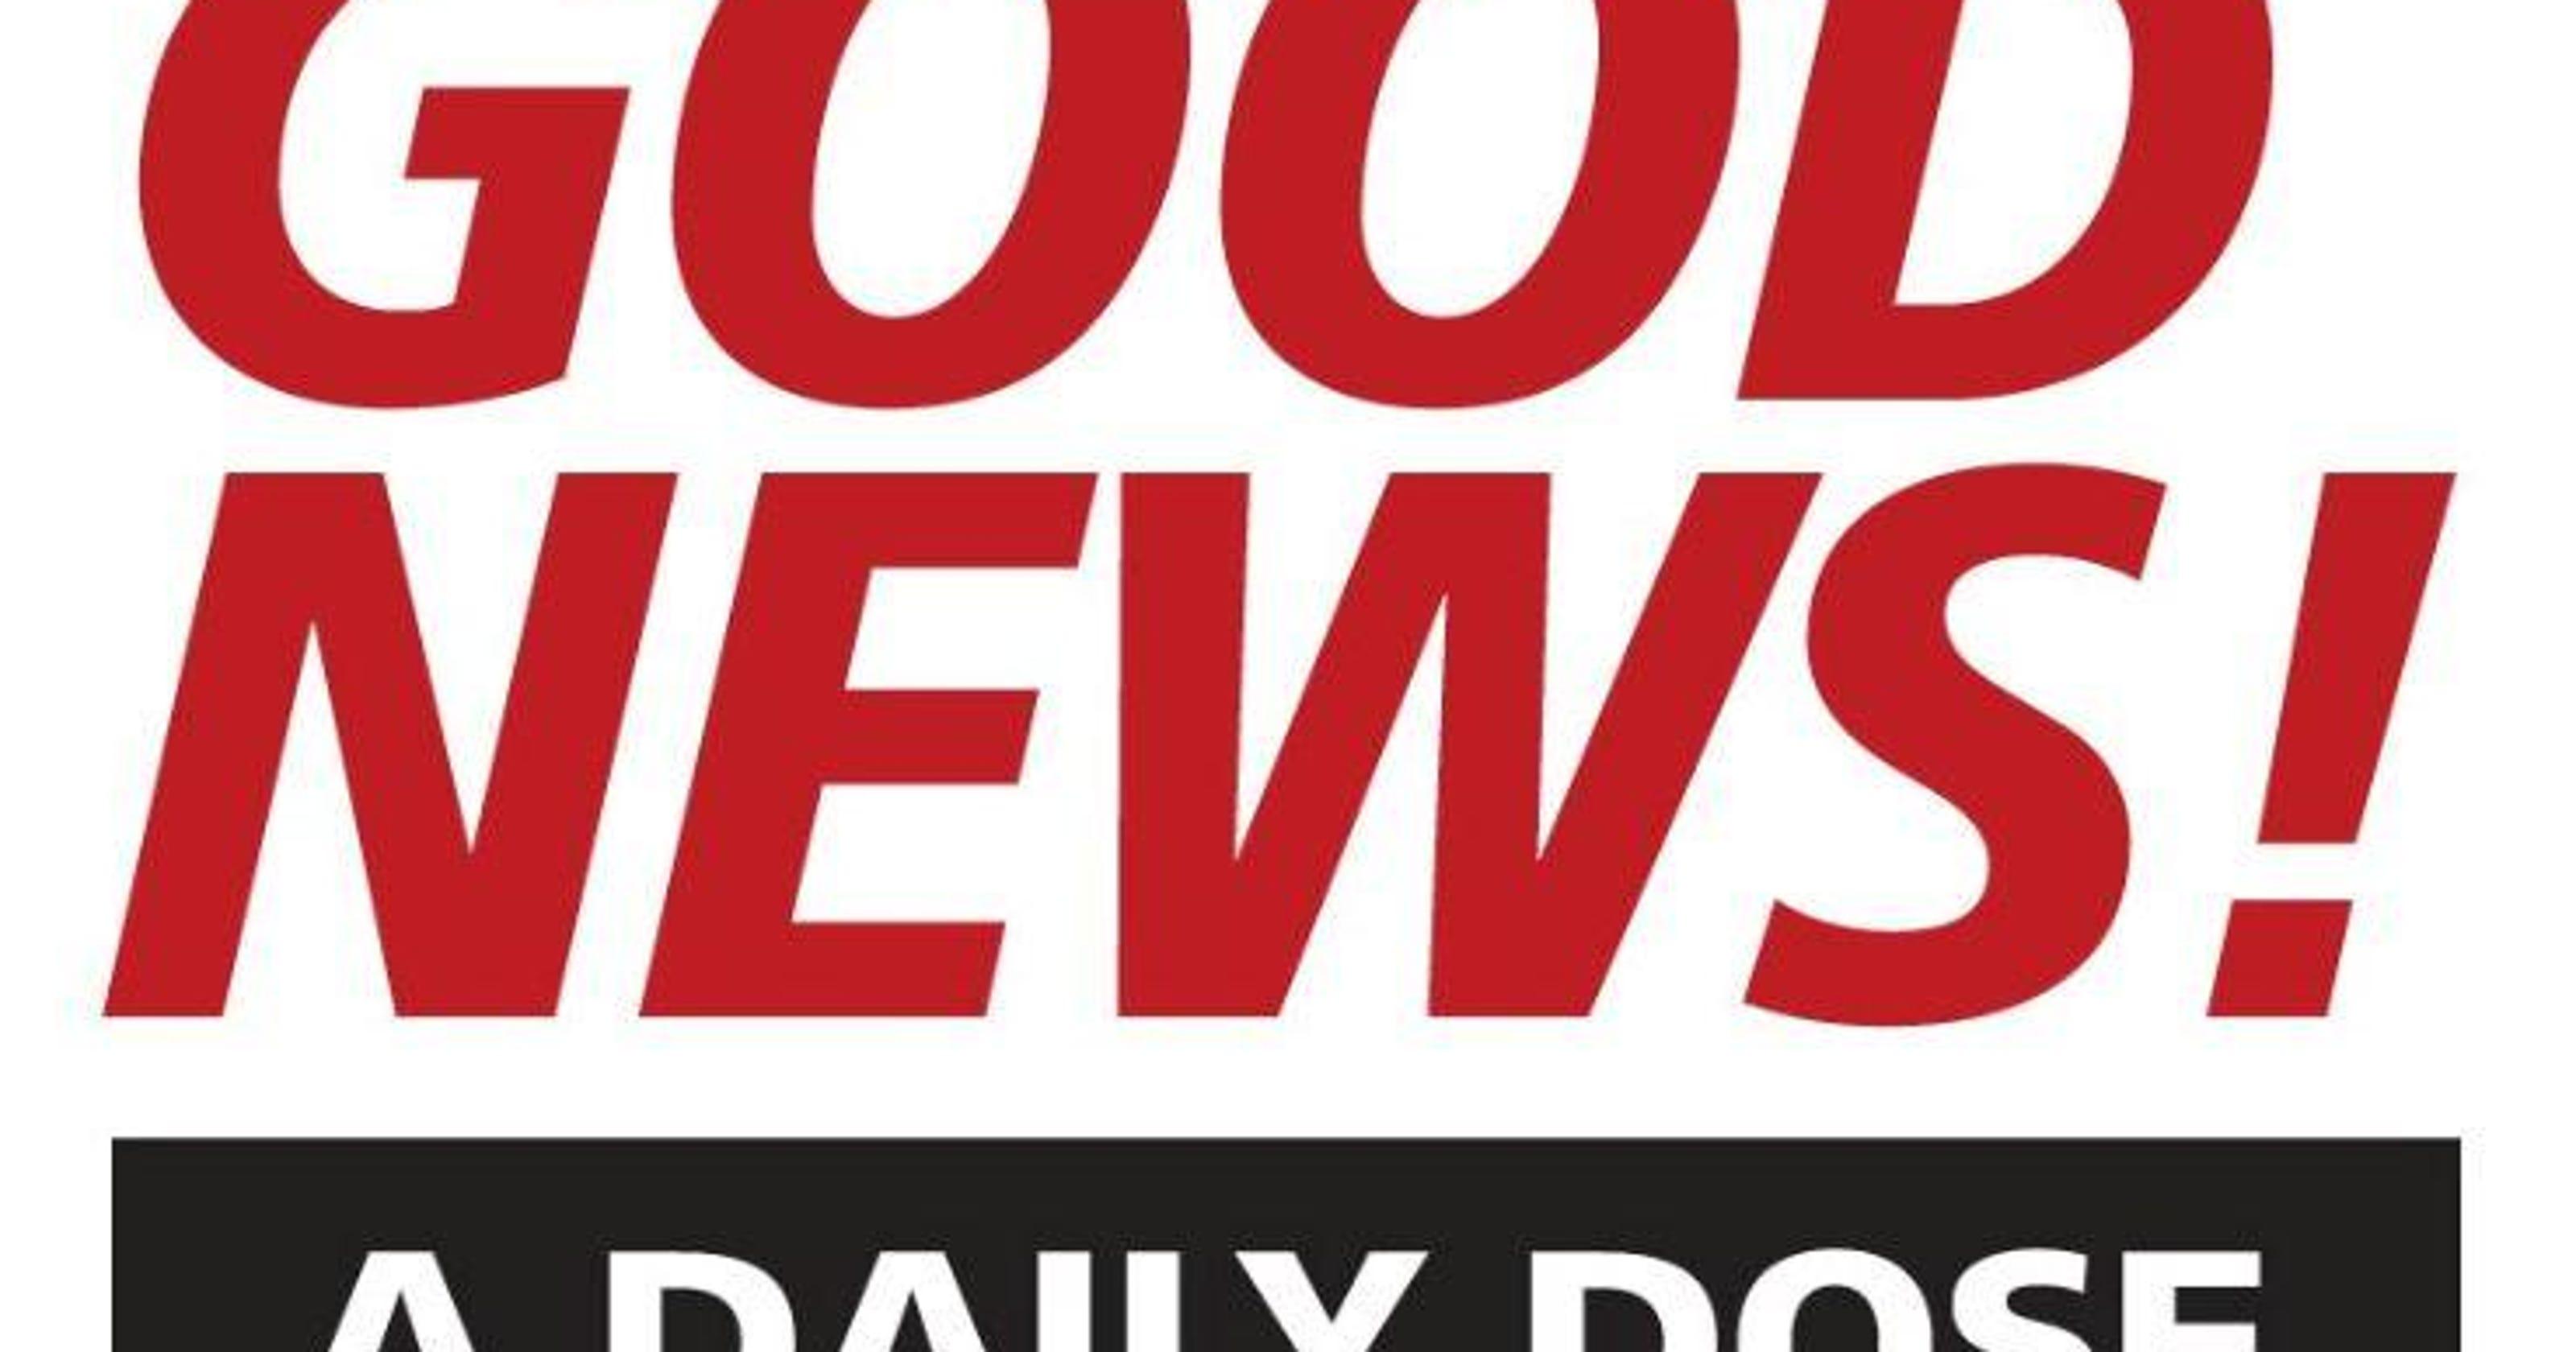 Good News: St  Vincent's opens new donation center